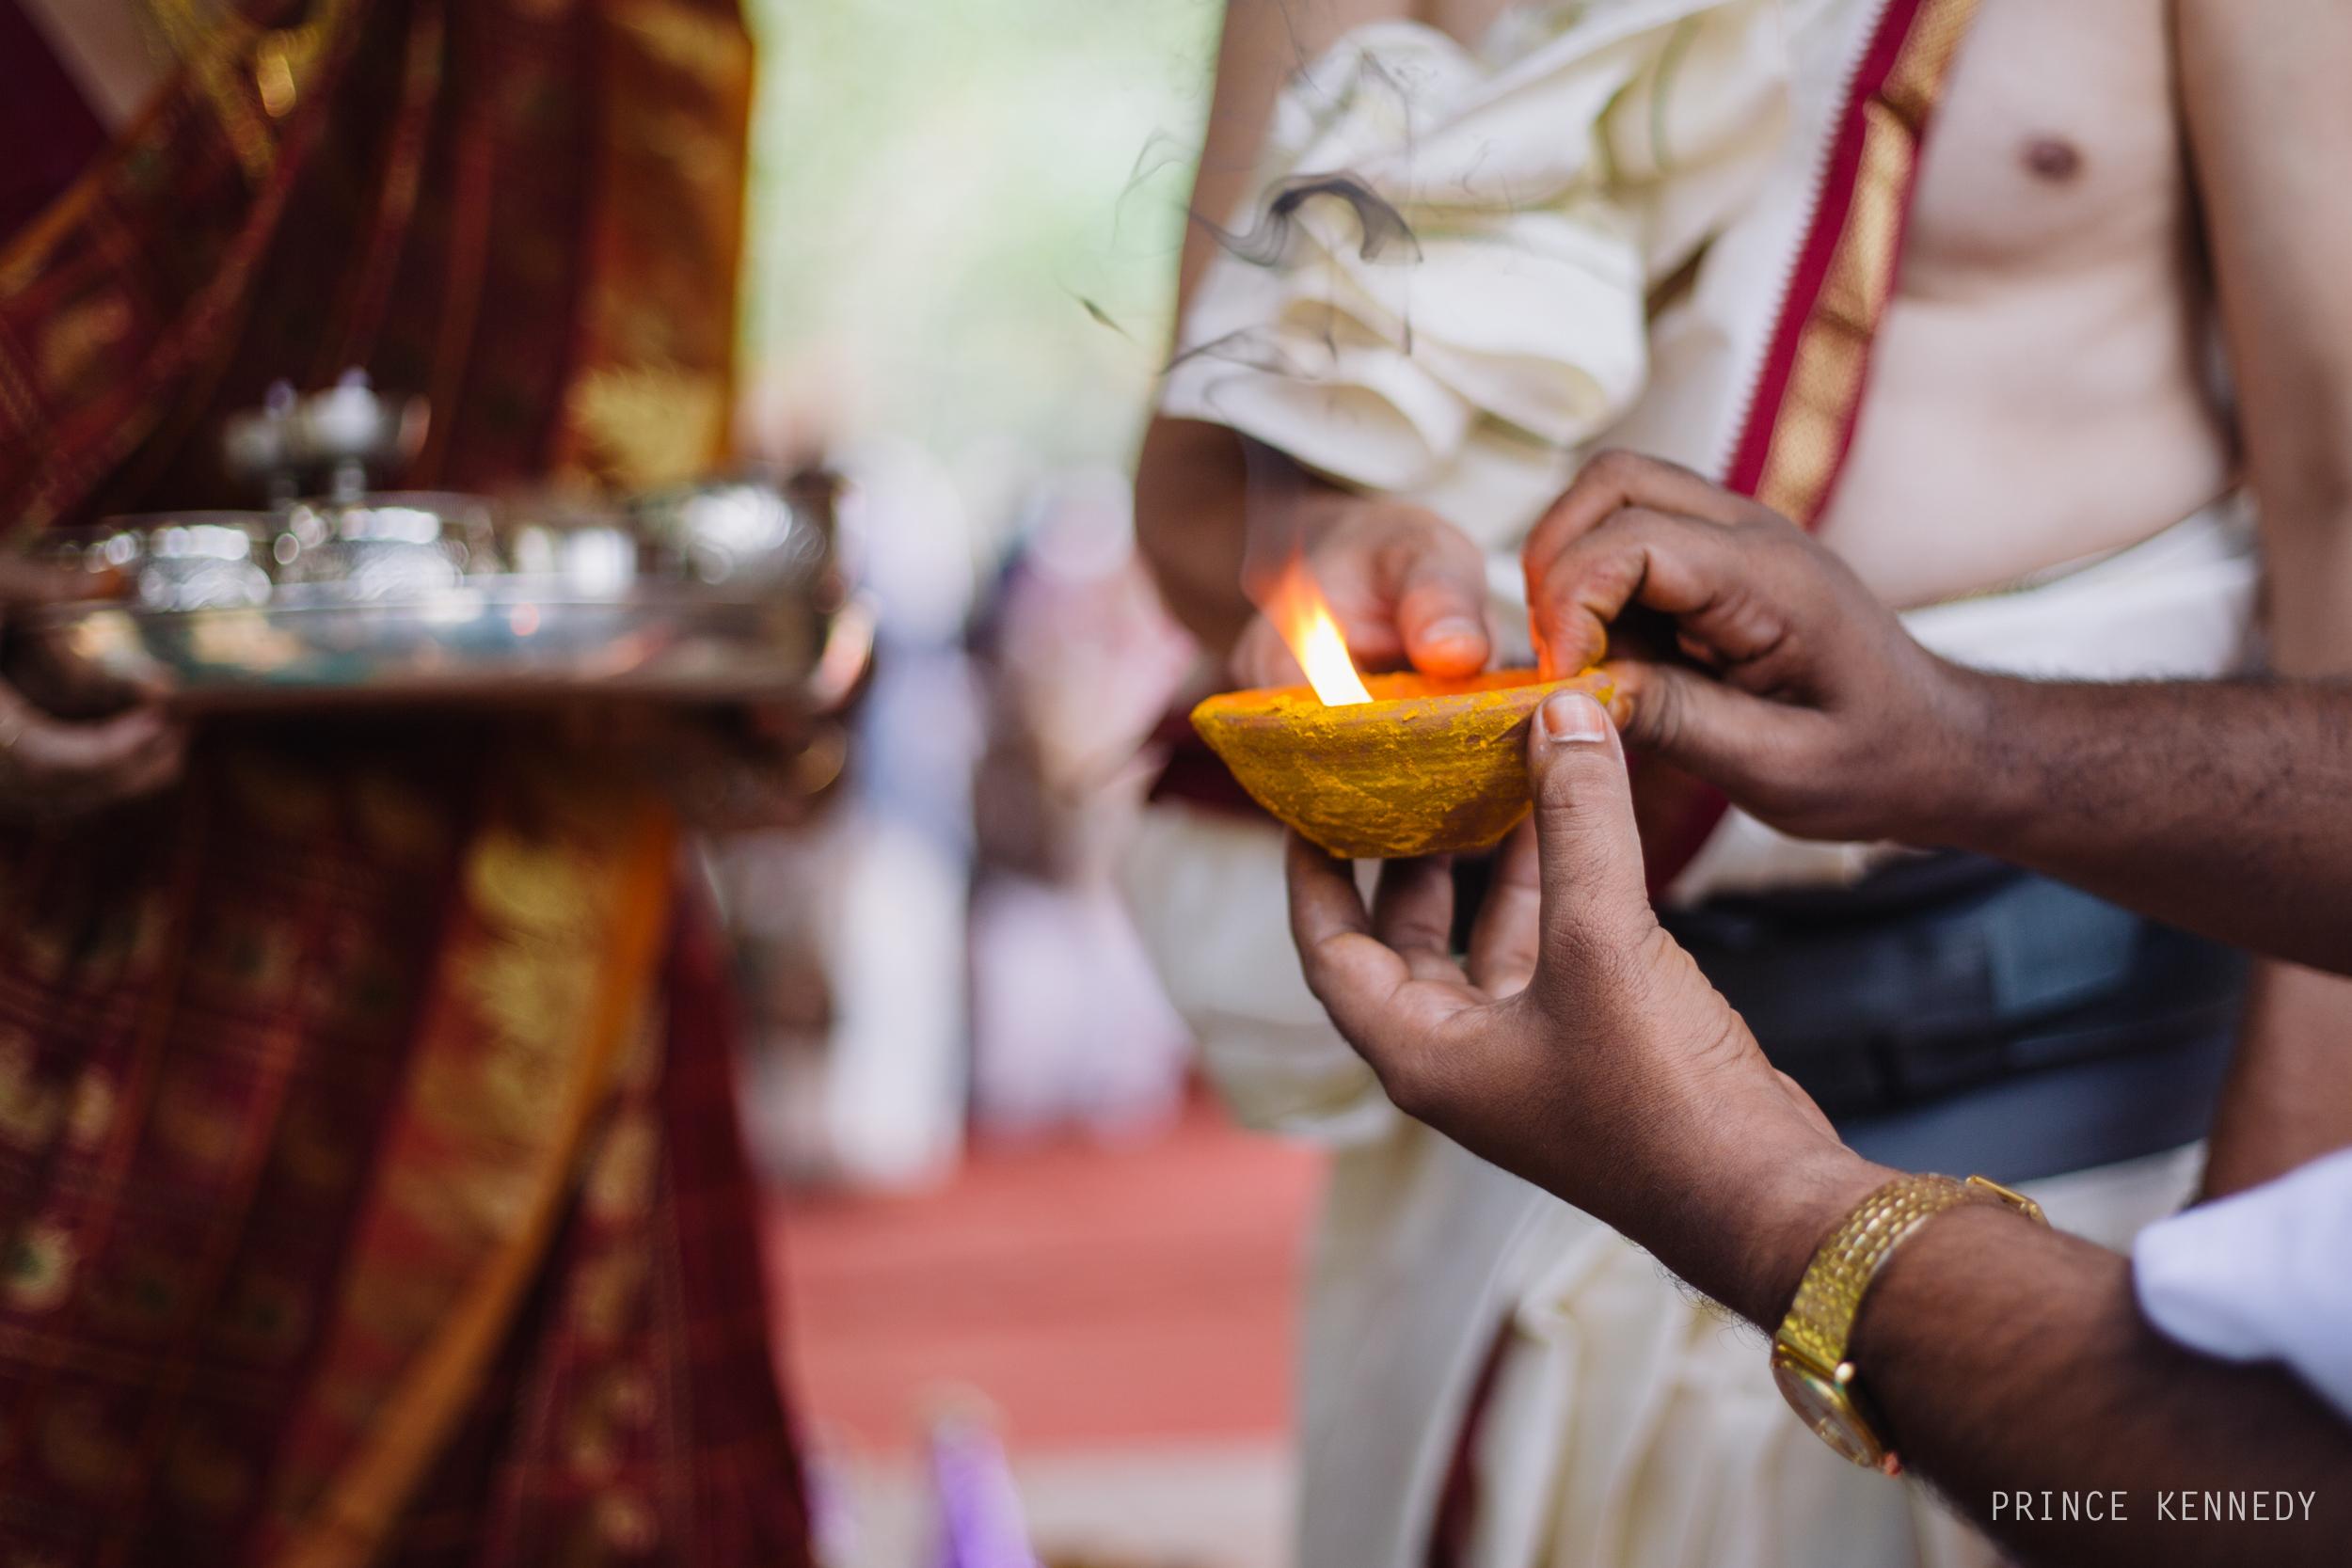 Athmajja-Nithesh-Engagement-Couple-Portrait-Portraiture-Wedding-Couple-Portrait-Chennai-Photographer-Candid-Photography-Destination-Best-Prince-Kennedy-Photography-67.jpg